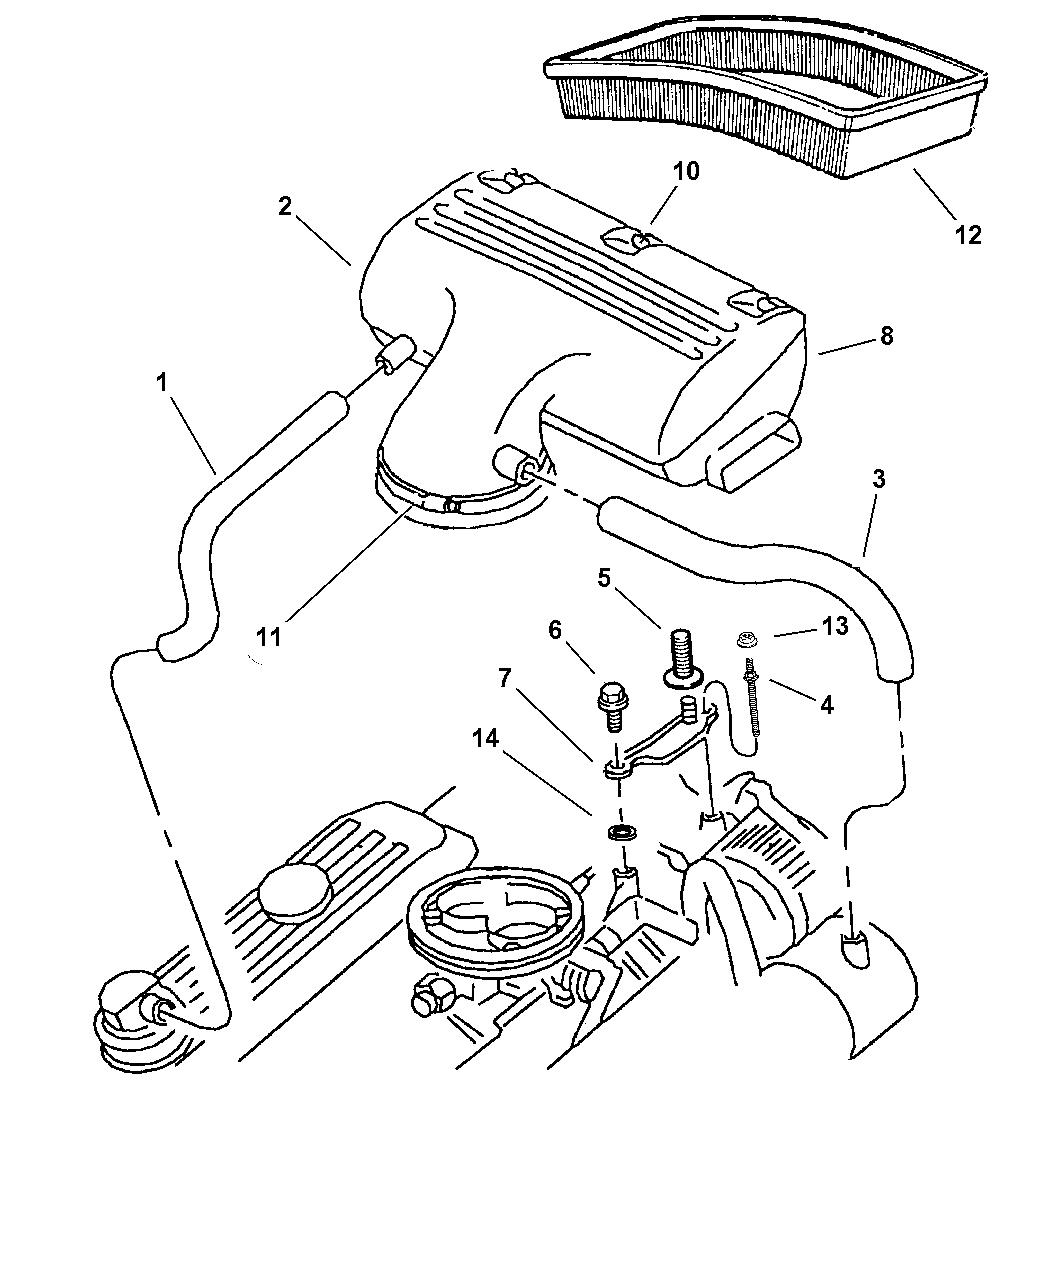 53030817 - Genuine Mopar HOSE-CRANKCASE VENT